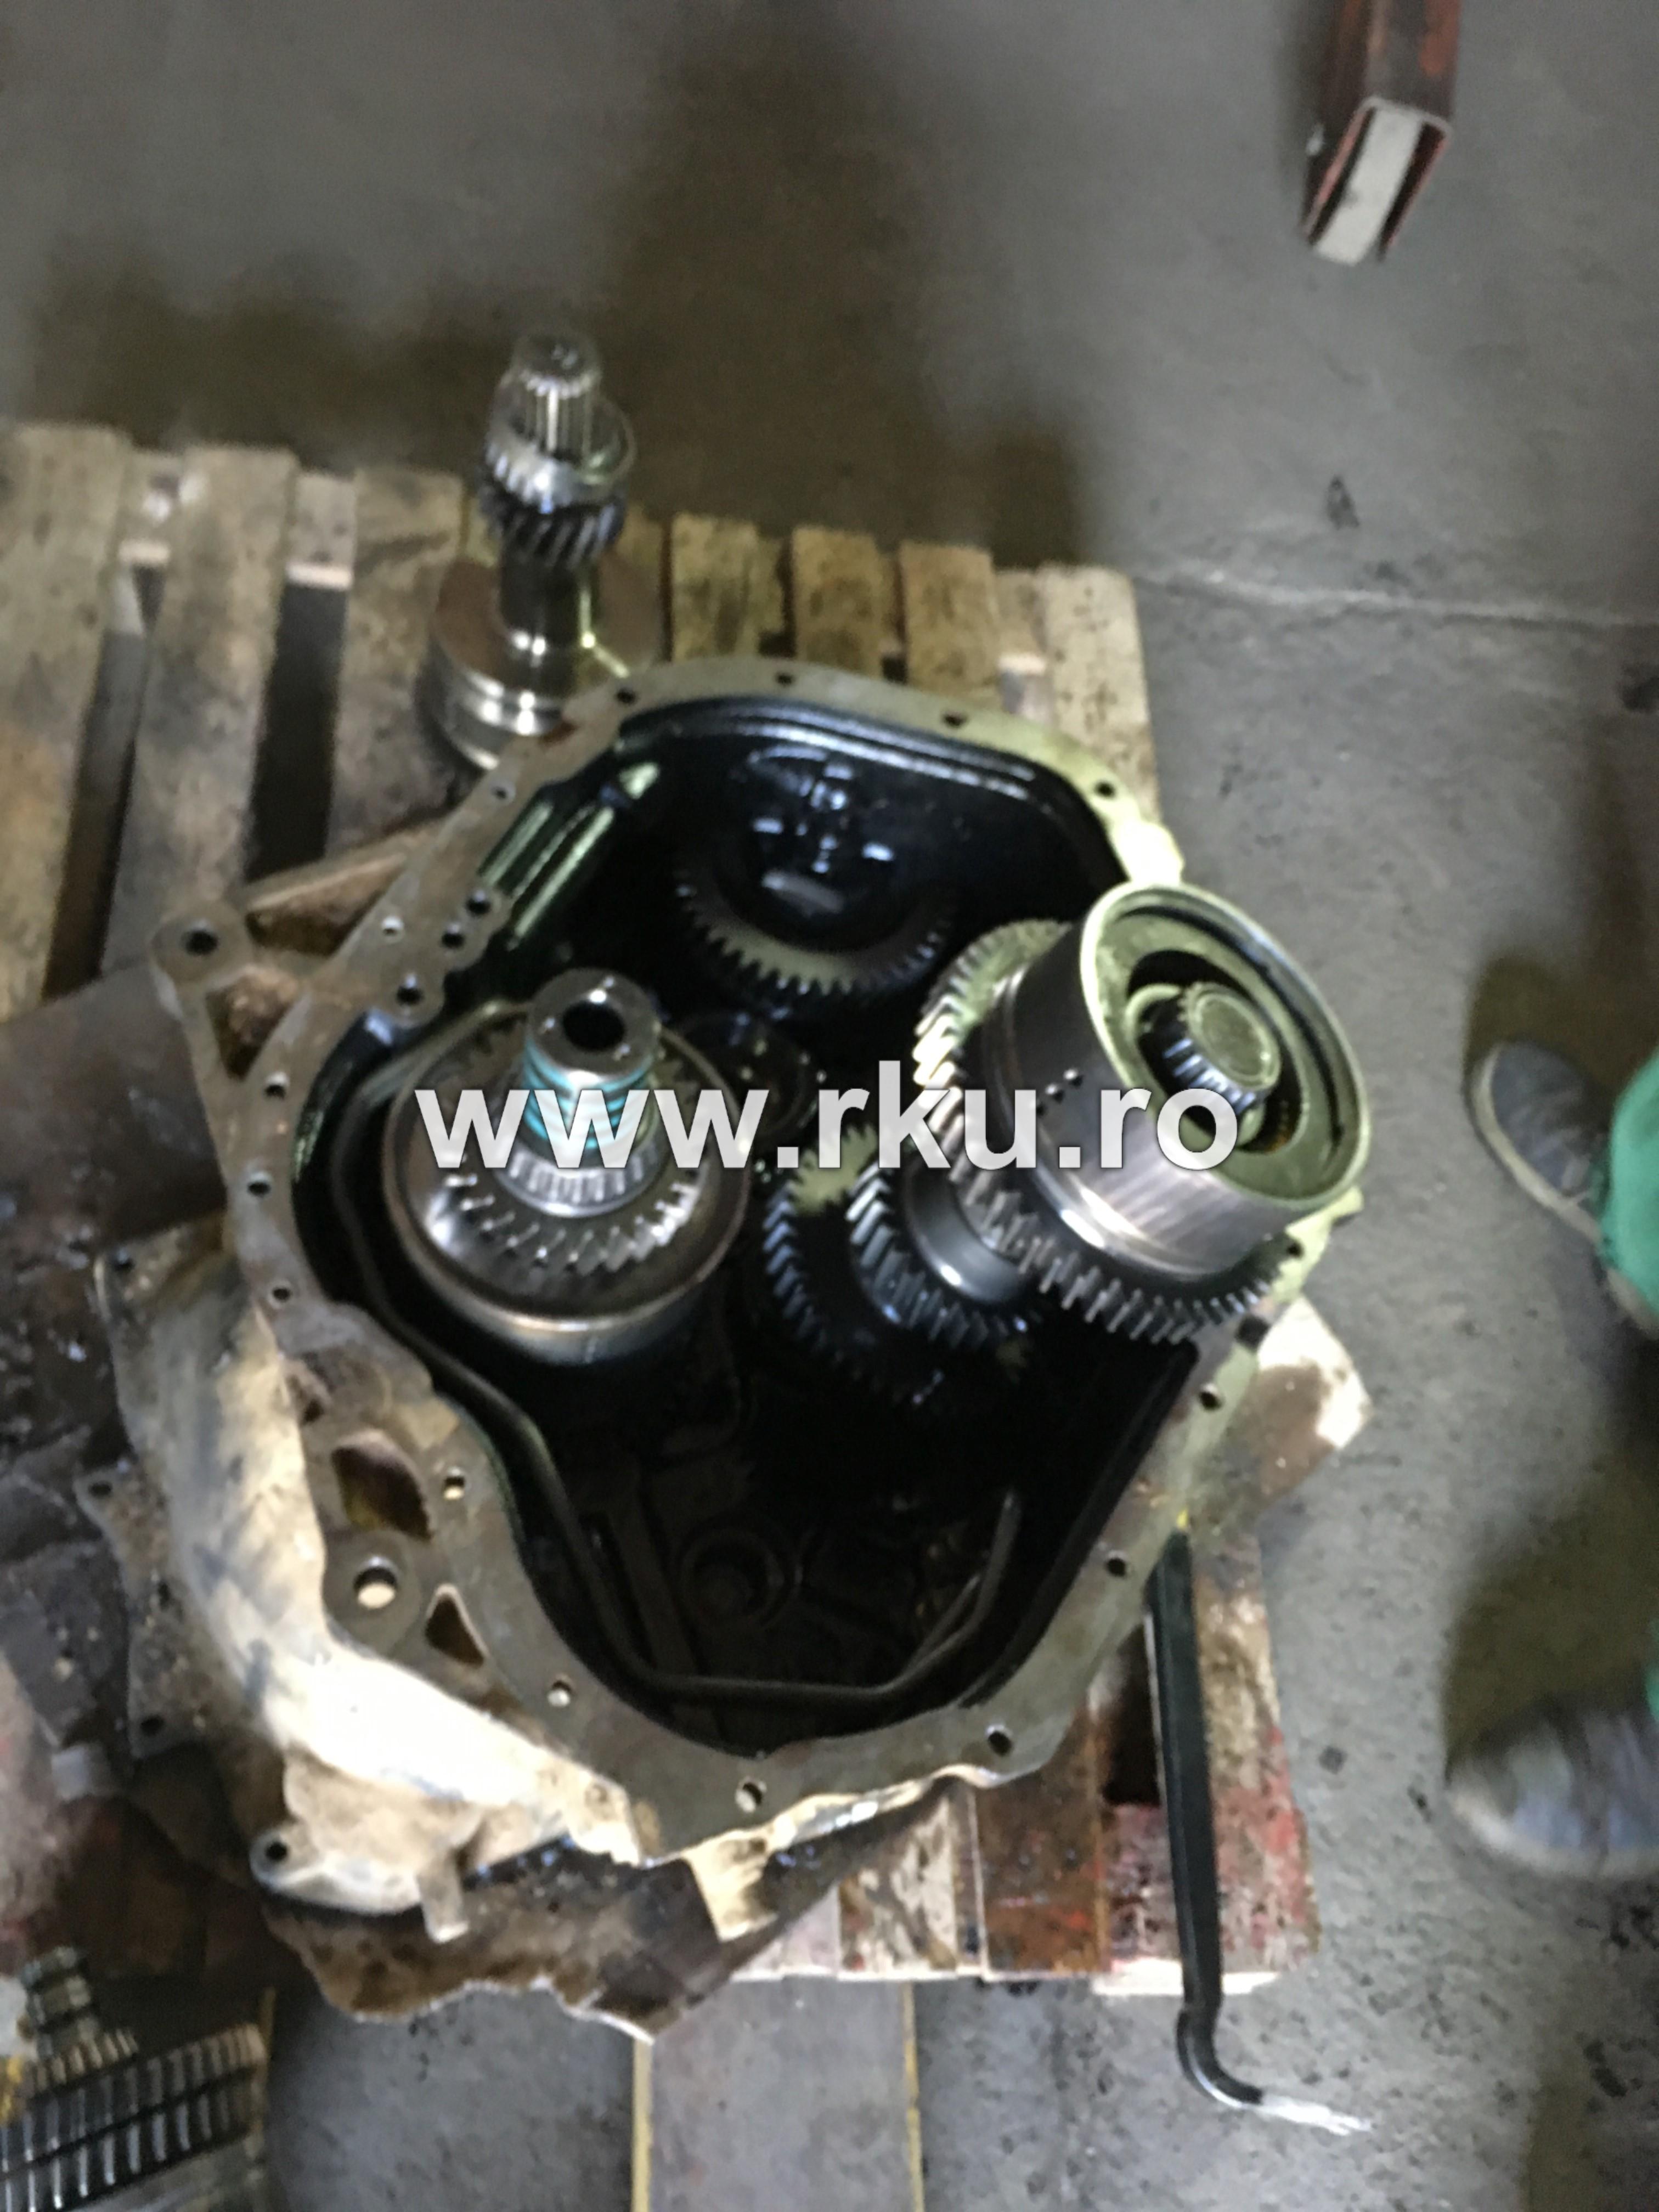 reparatie cutie de viteza buldoexavator JCB 4CX